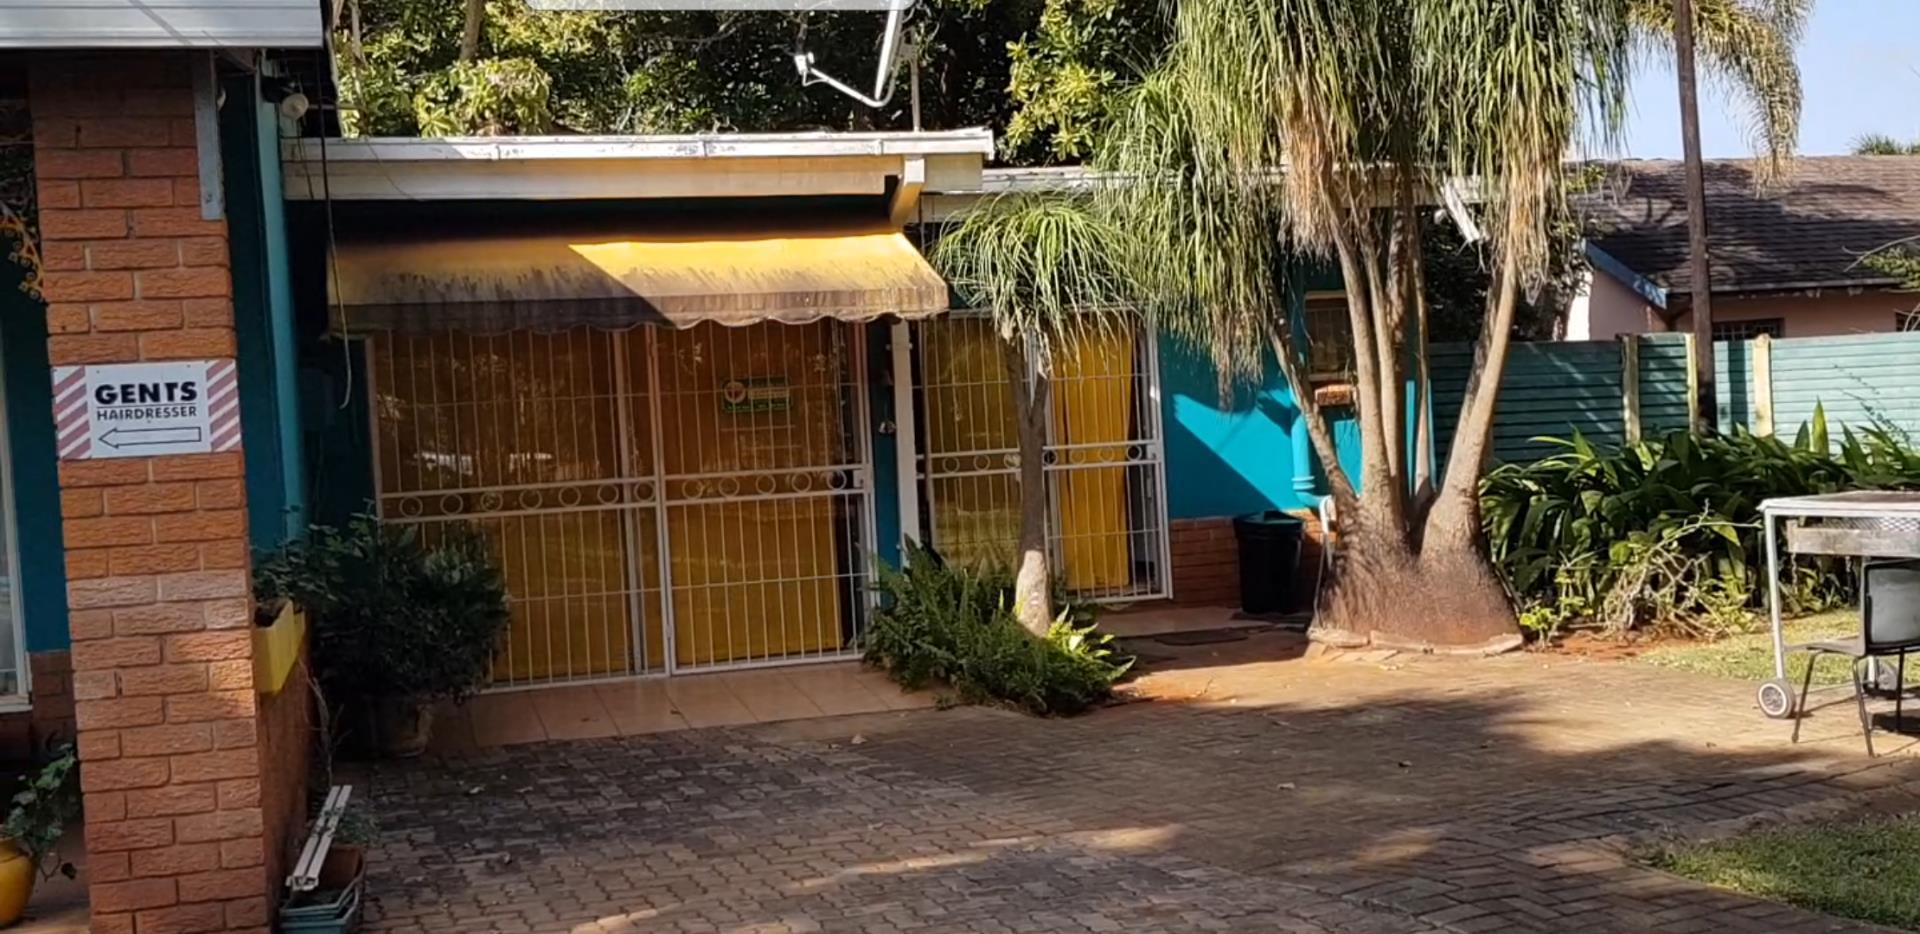 3 Bedroom House For Sale in Louis Trichardt